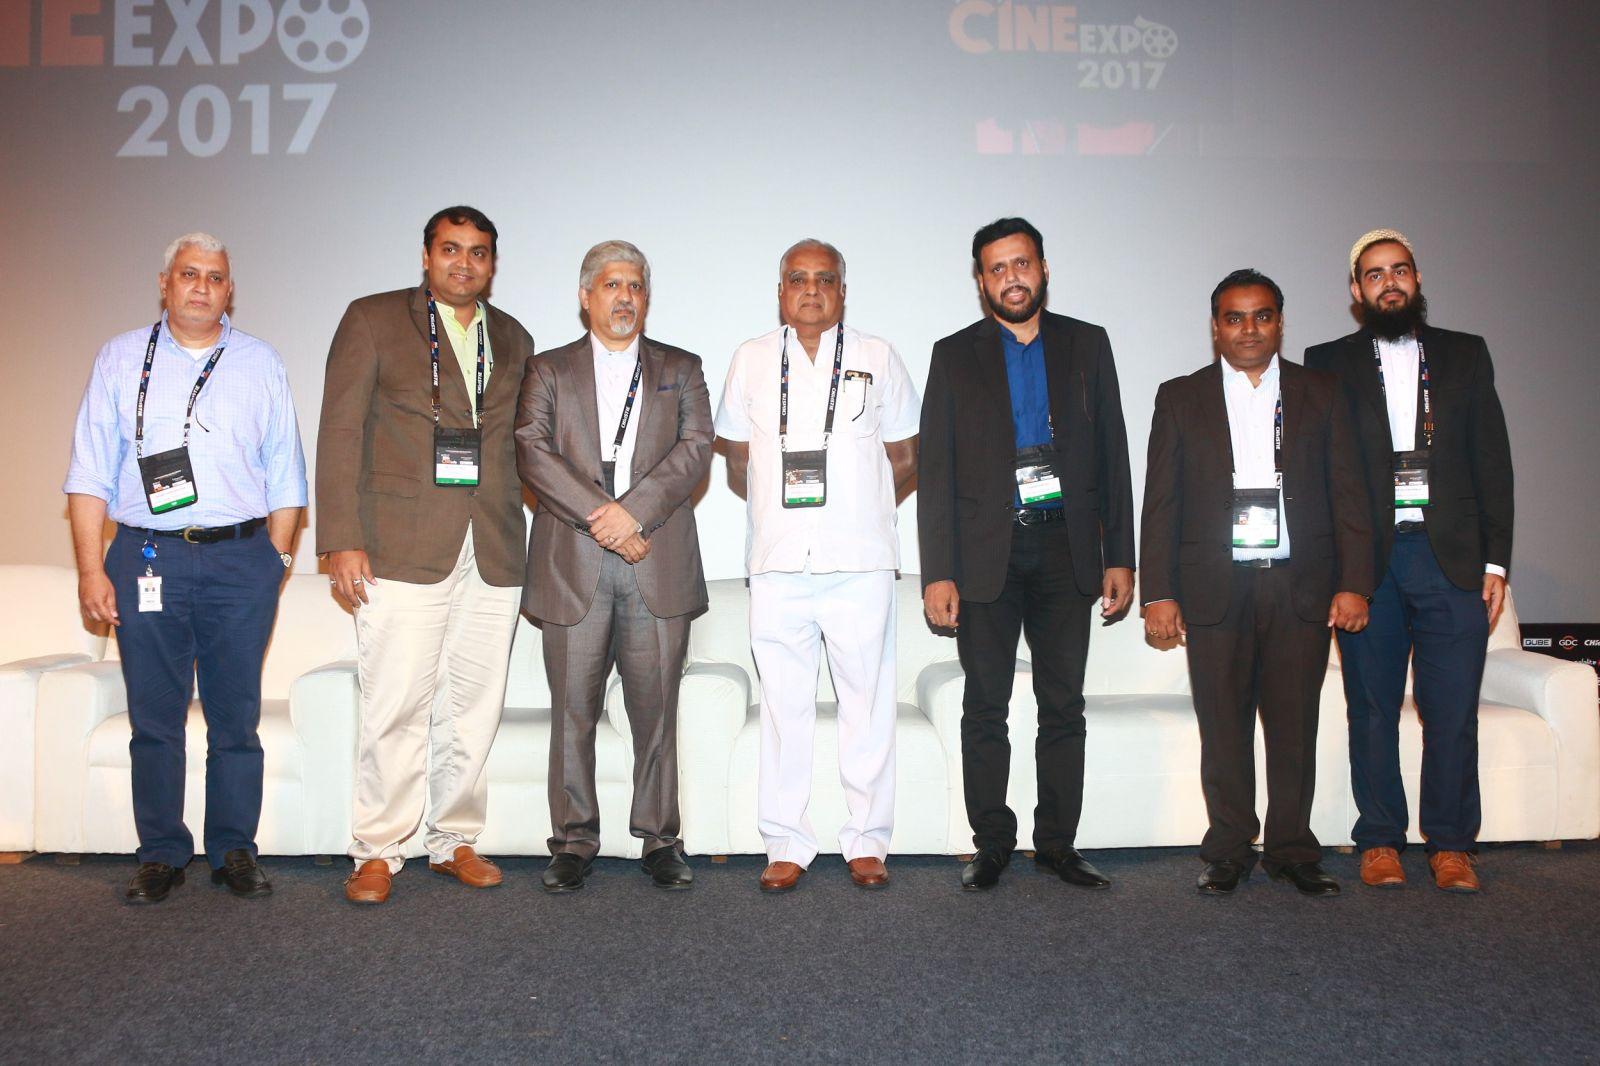 Big Cine Expo Exbetion Inauguration Pics (10)